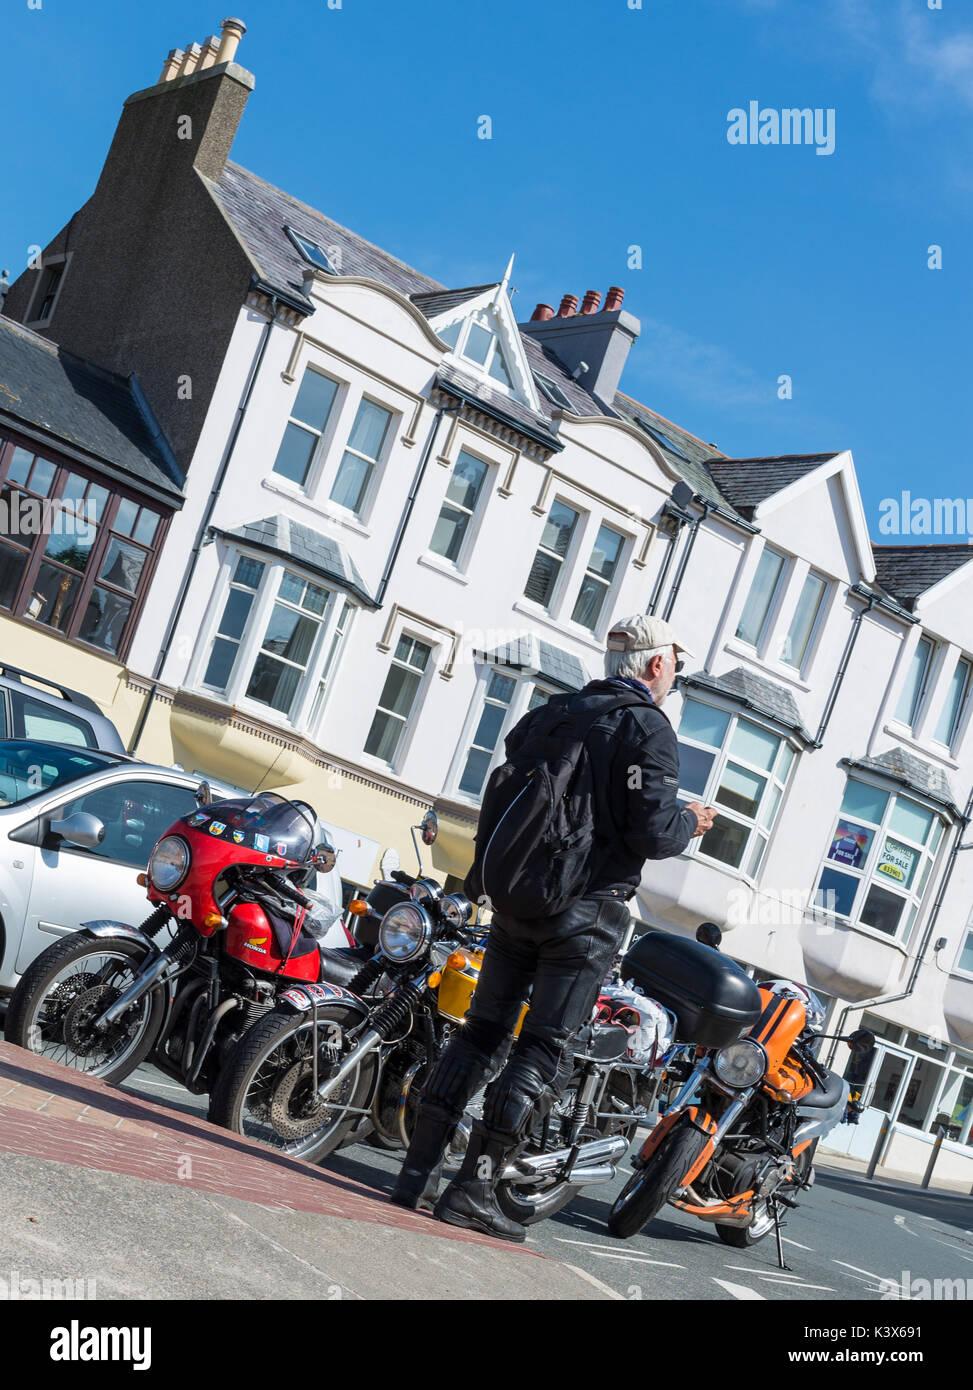 motorbiker stock photos motorbiker stock images alamy. Black Bedroom Furniture Sets. Home Design Ideas